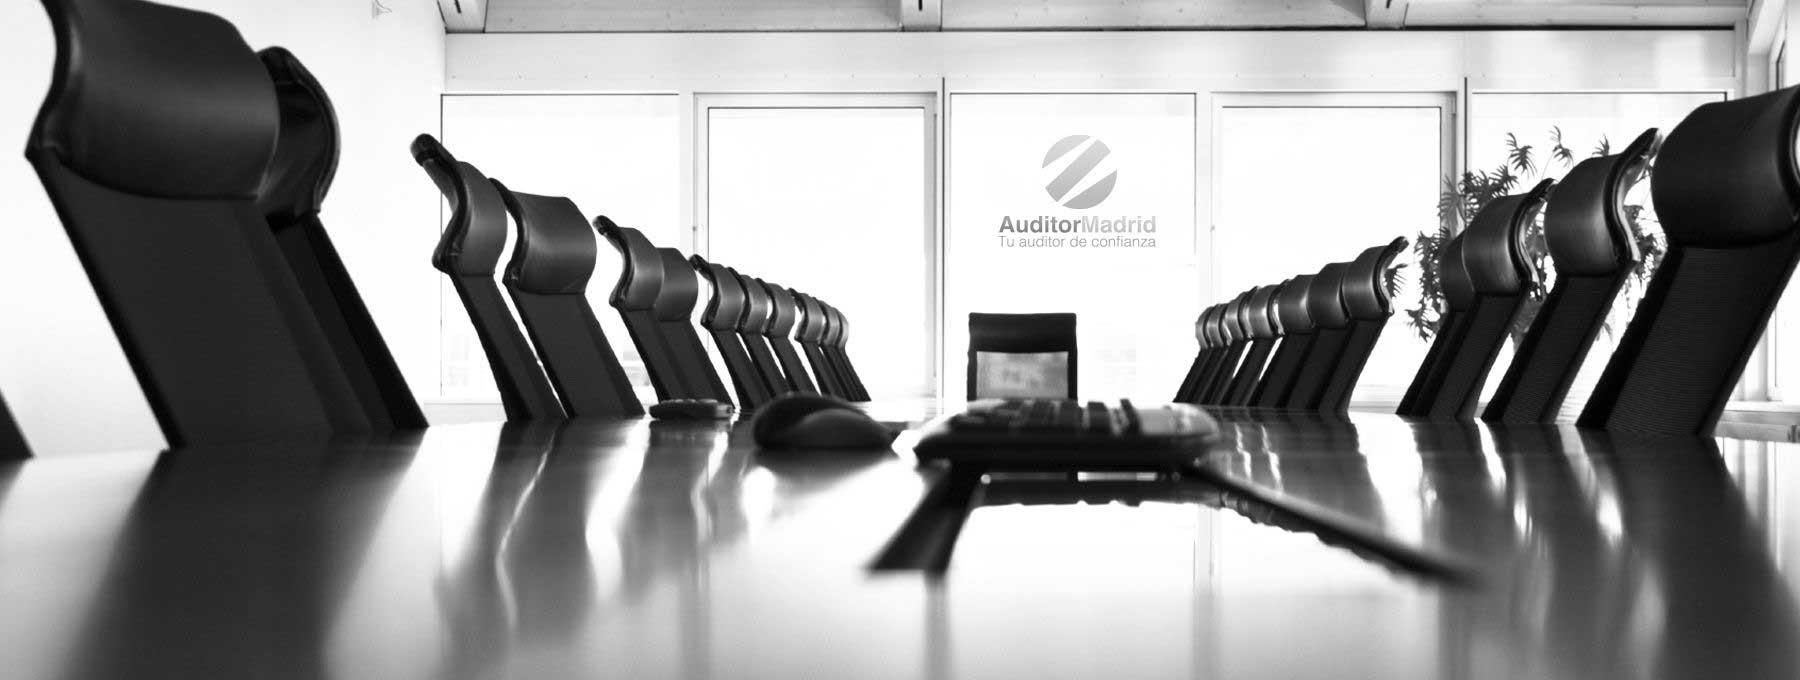 Auditor Madrid